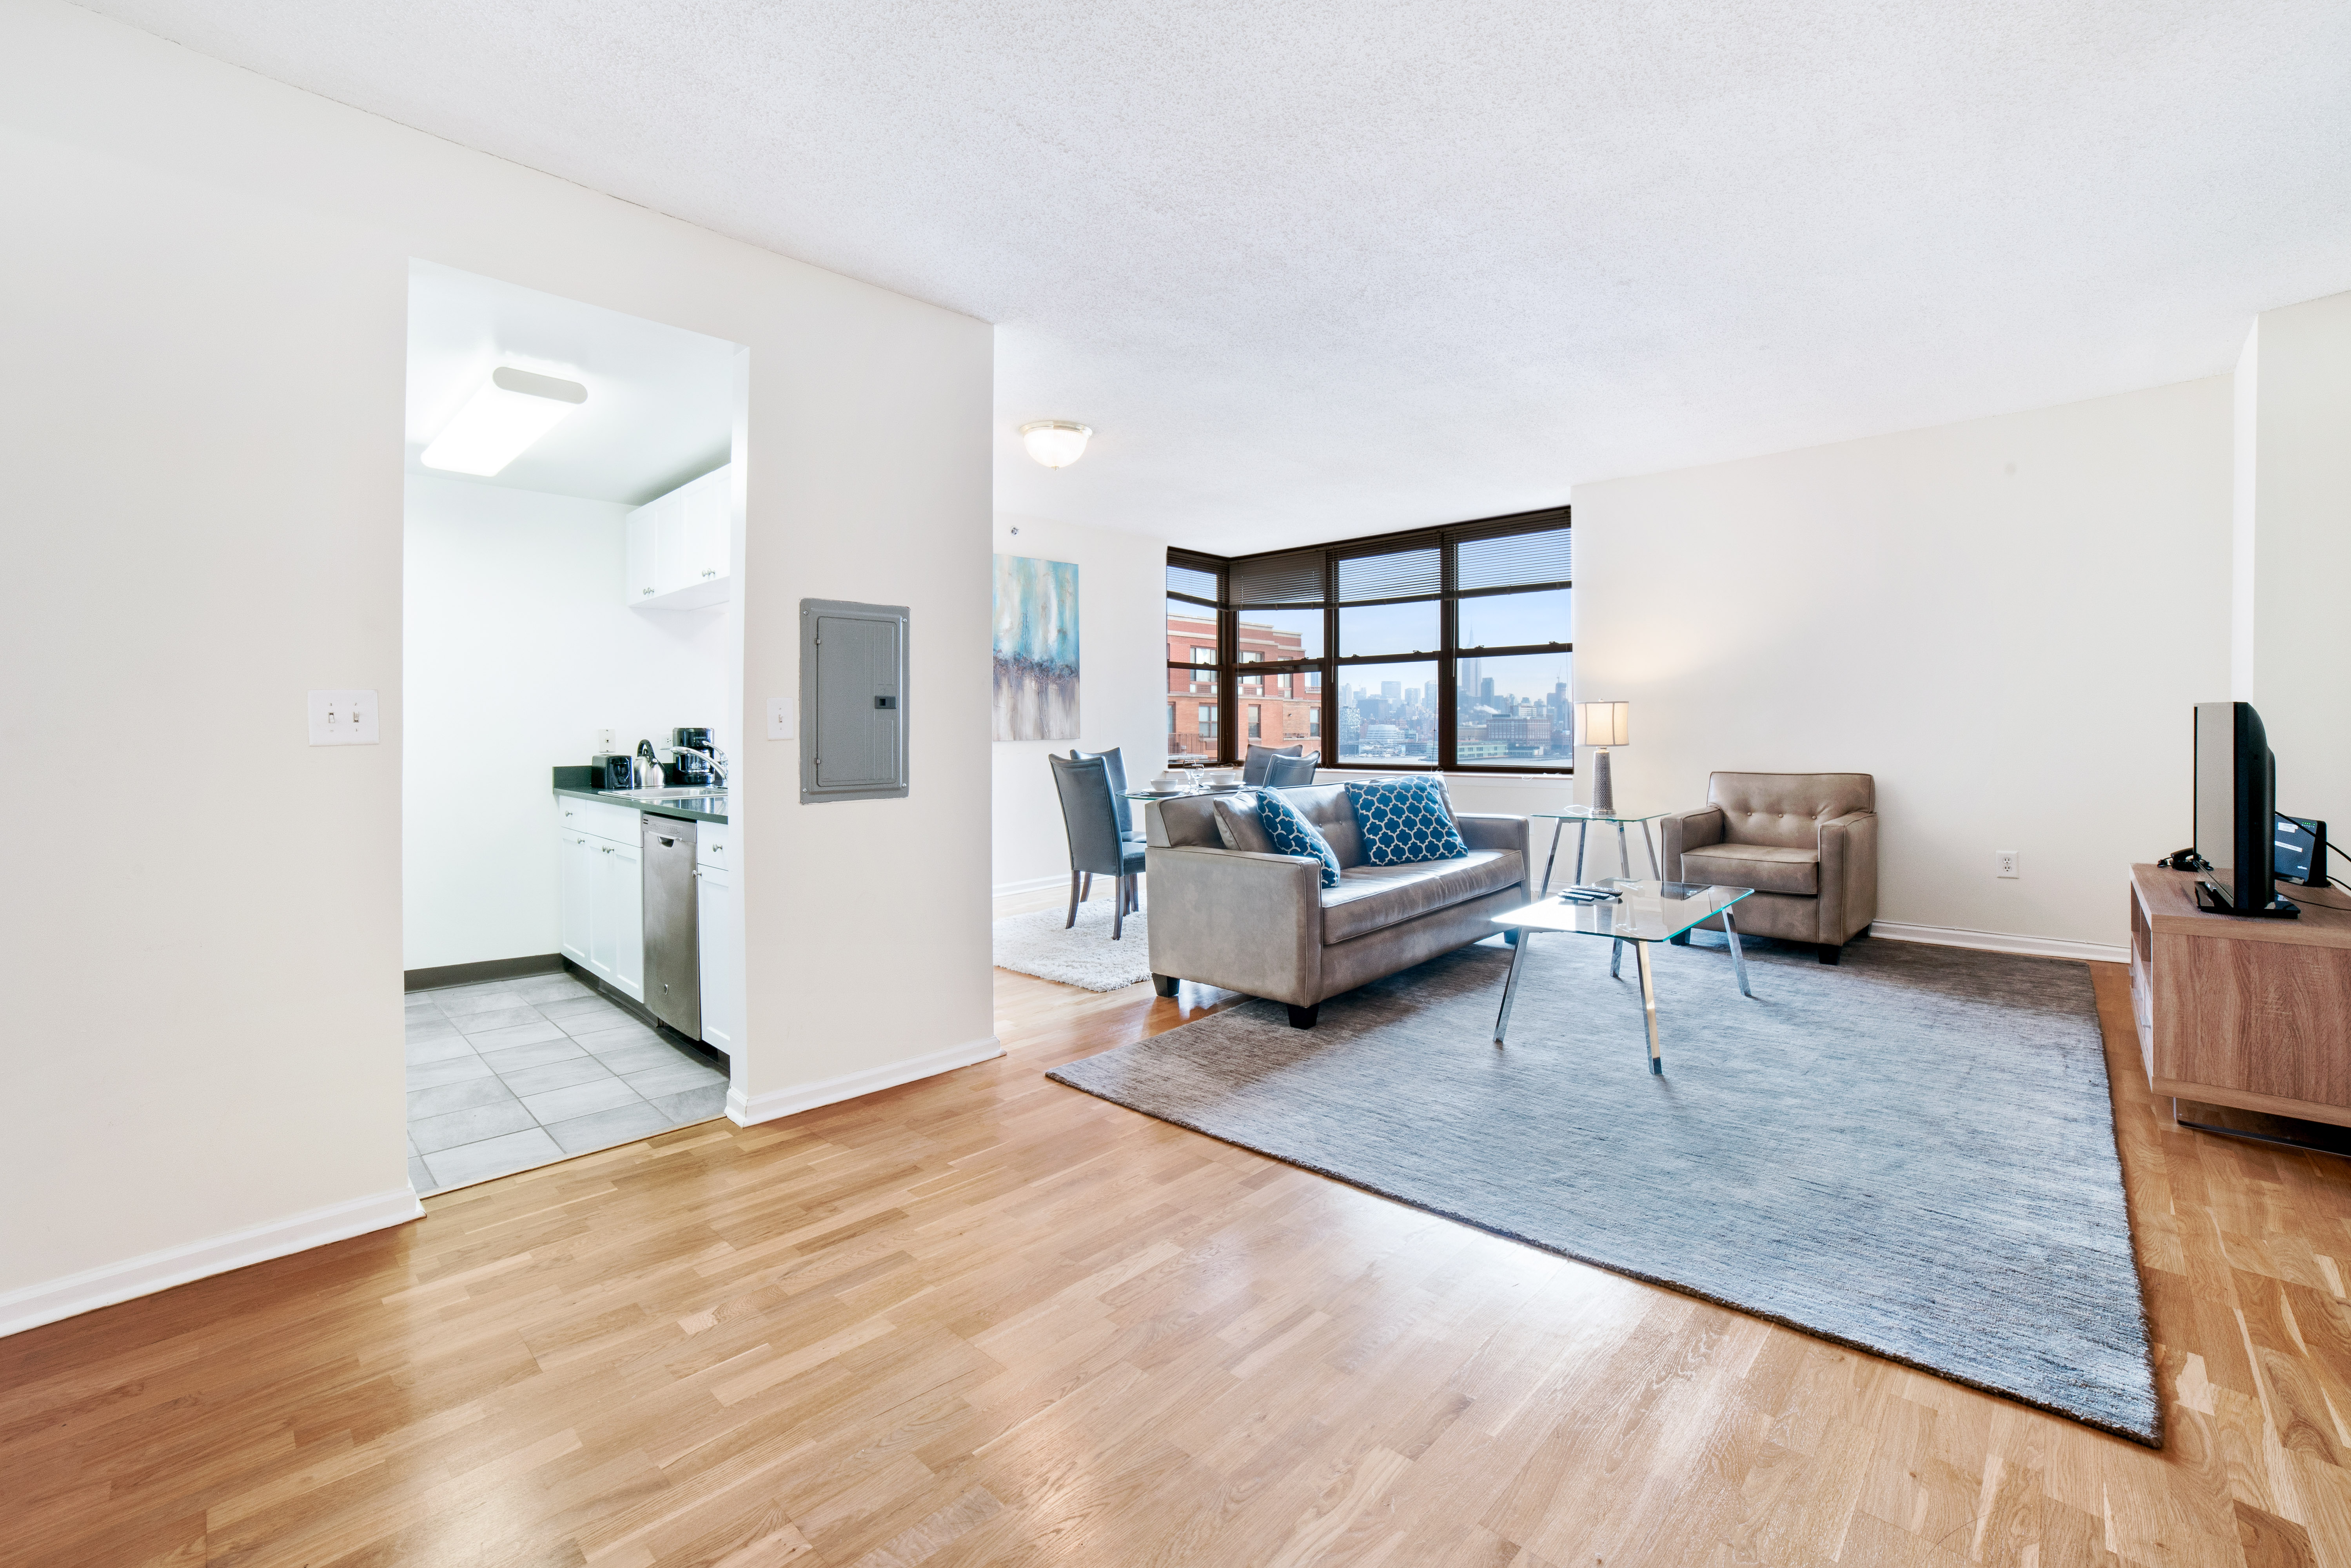 image 6 furnished 1 bedroom Apartment for rent in Hoboken, Hudson County